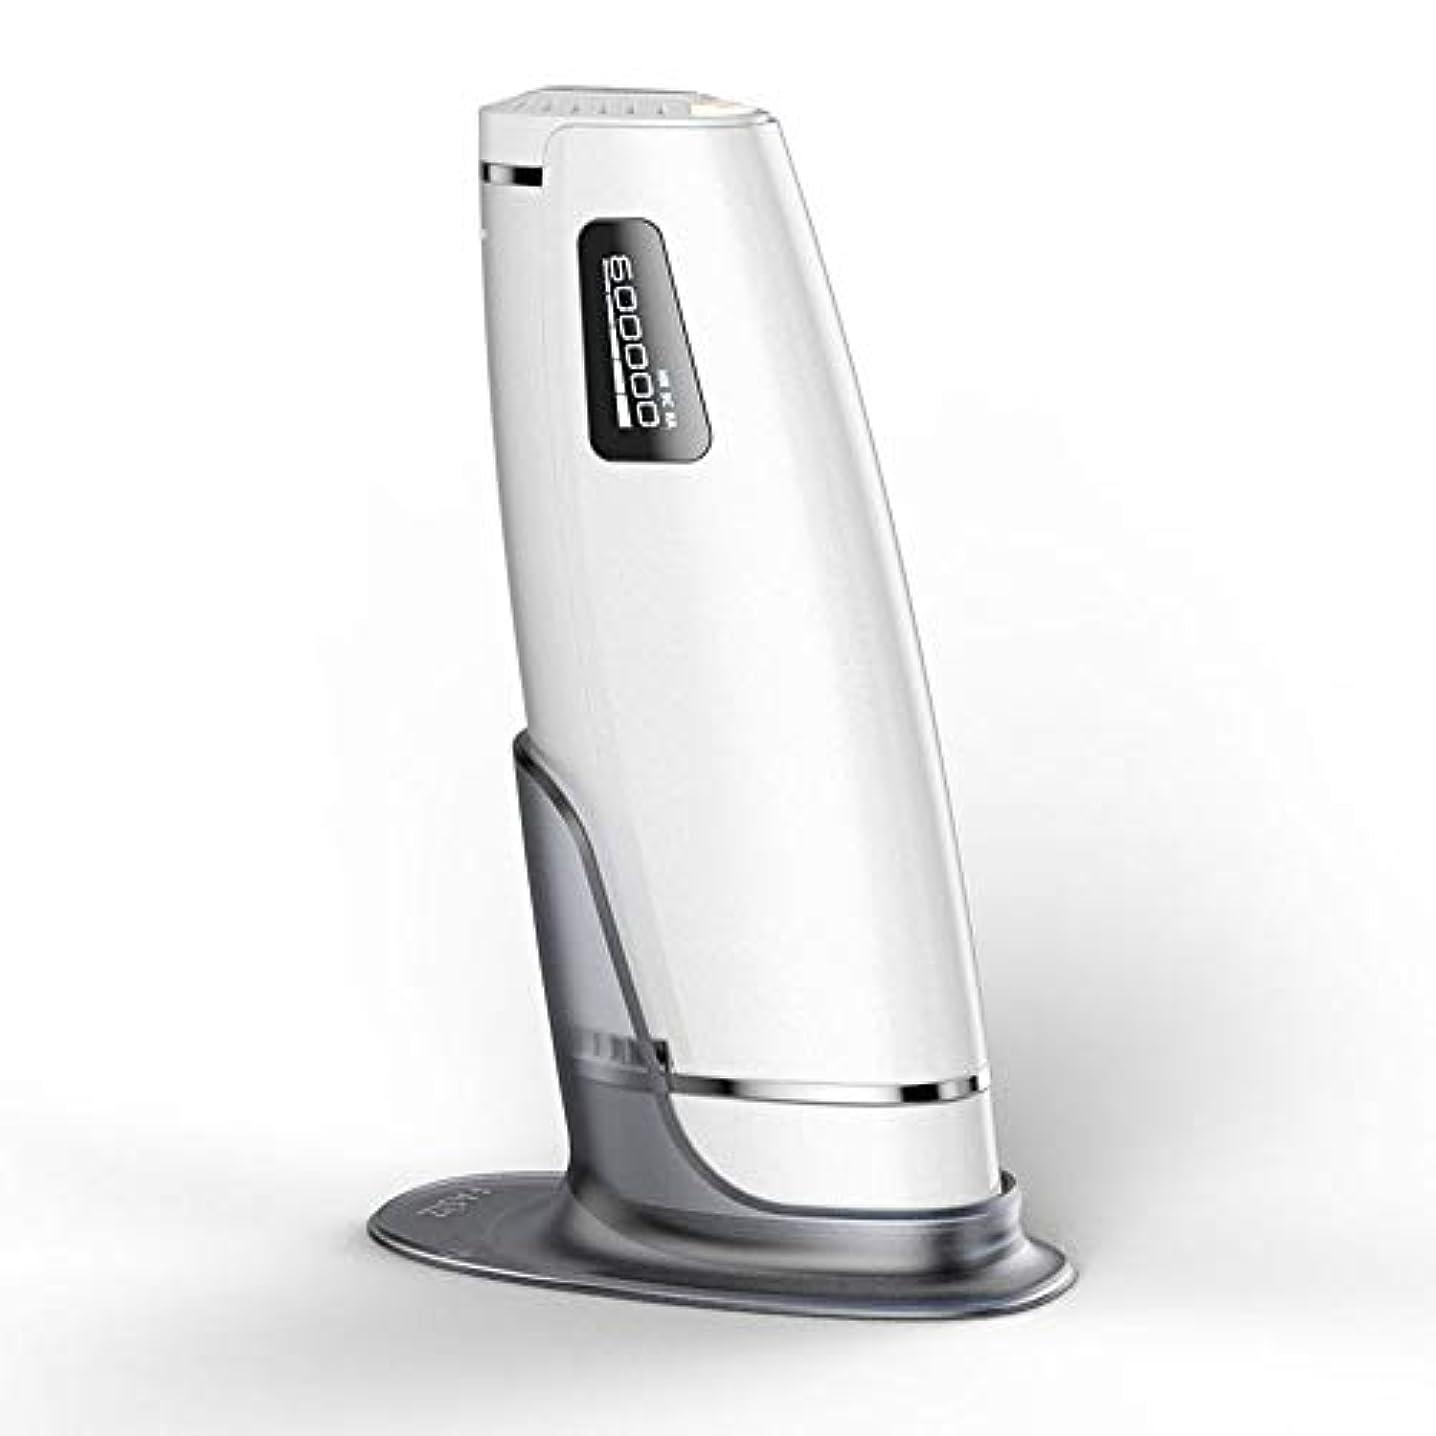 Nuanxin 家庭用自動痛みのない毛の除去剤、白、携帯用永久的な毛の除去剤、二重モード、5つの速度調節、サイズ20.5 X 4.5 X 7 Cm F30